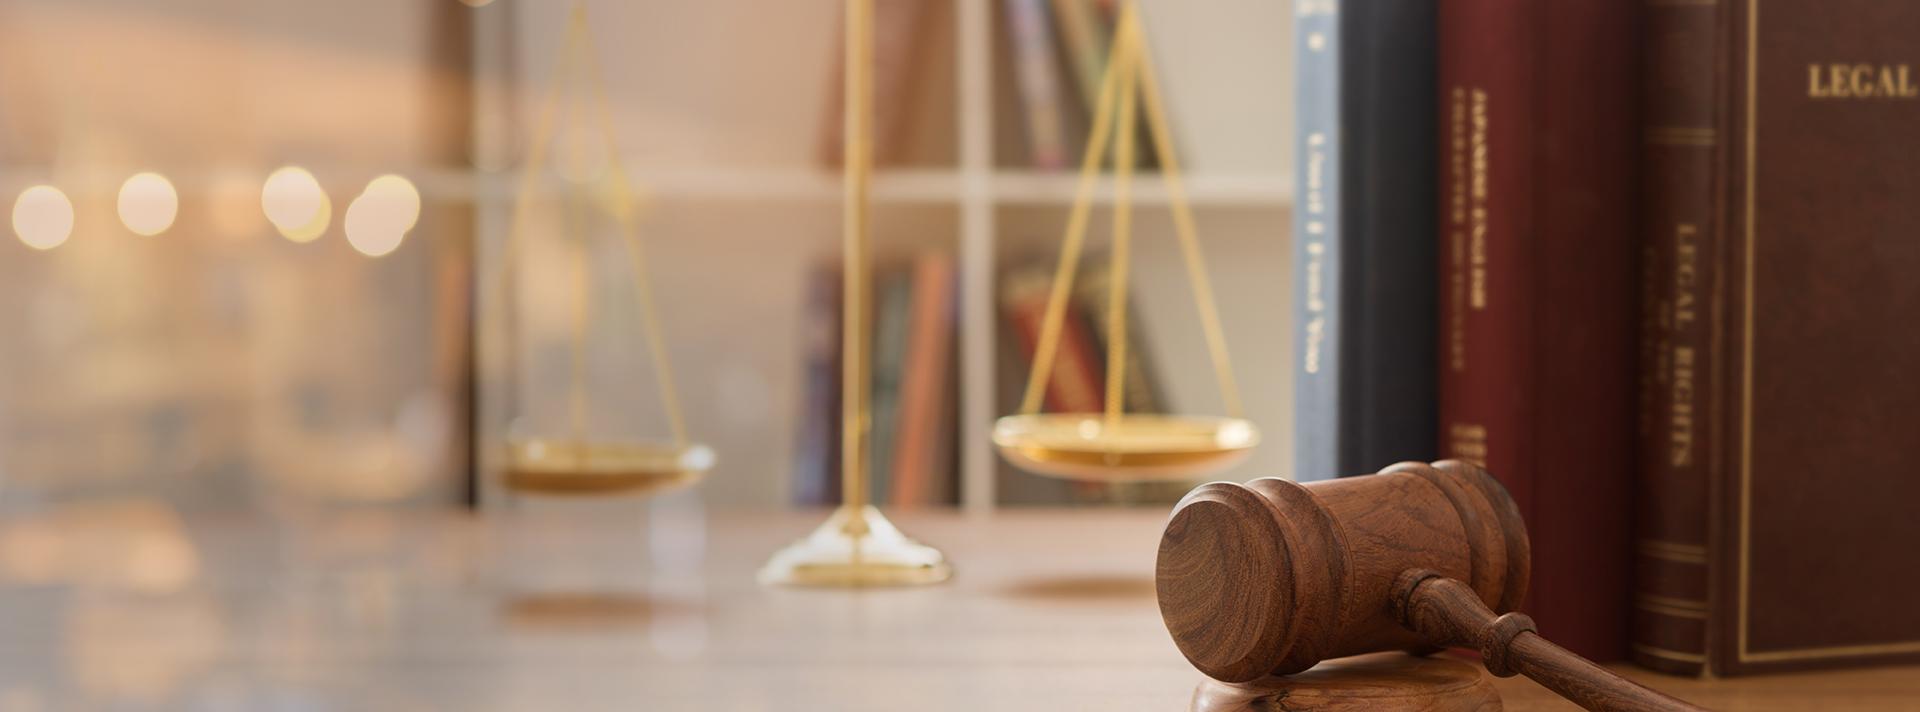 Regulations, Laws & Standards Hero Graphic